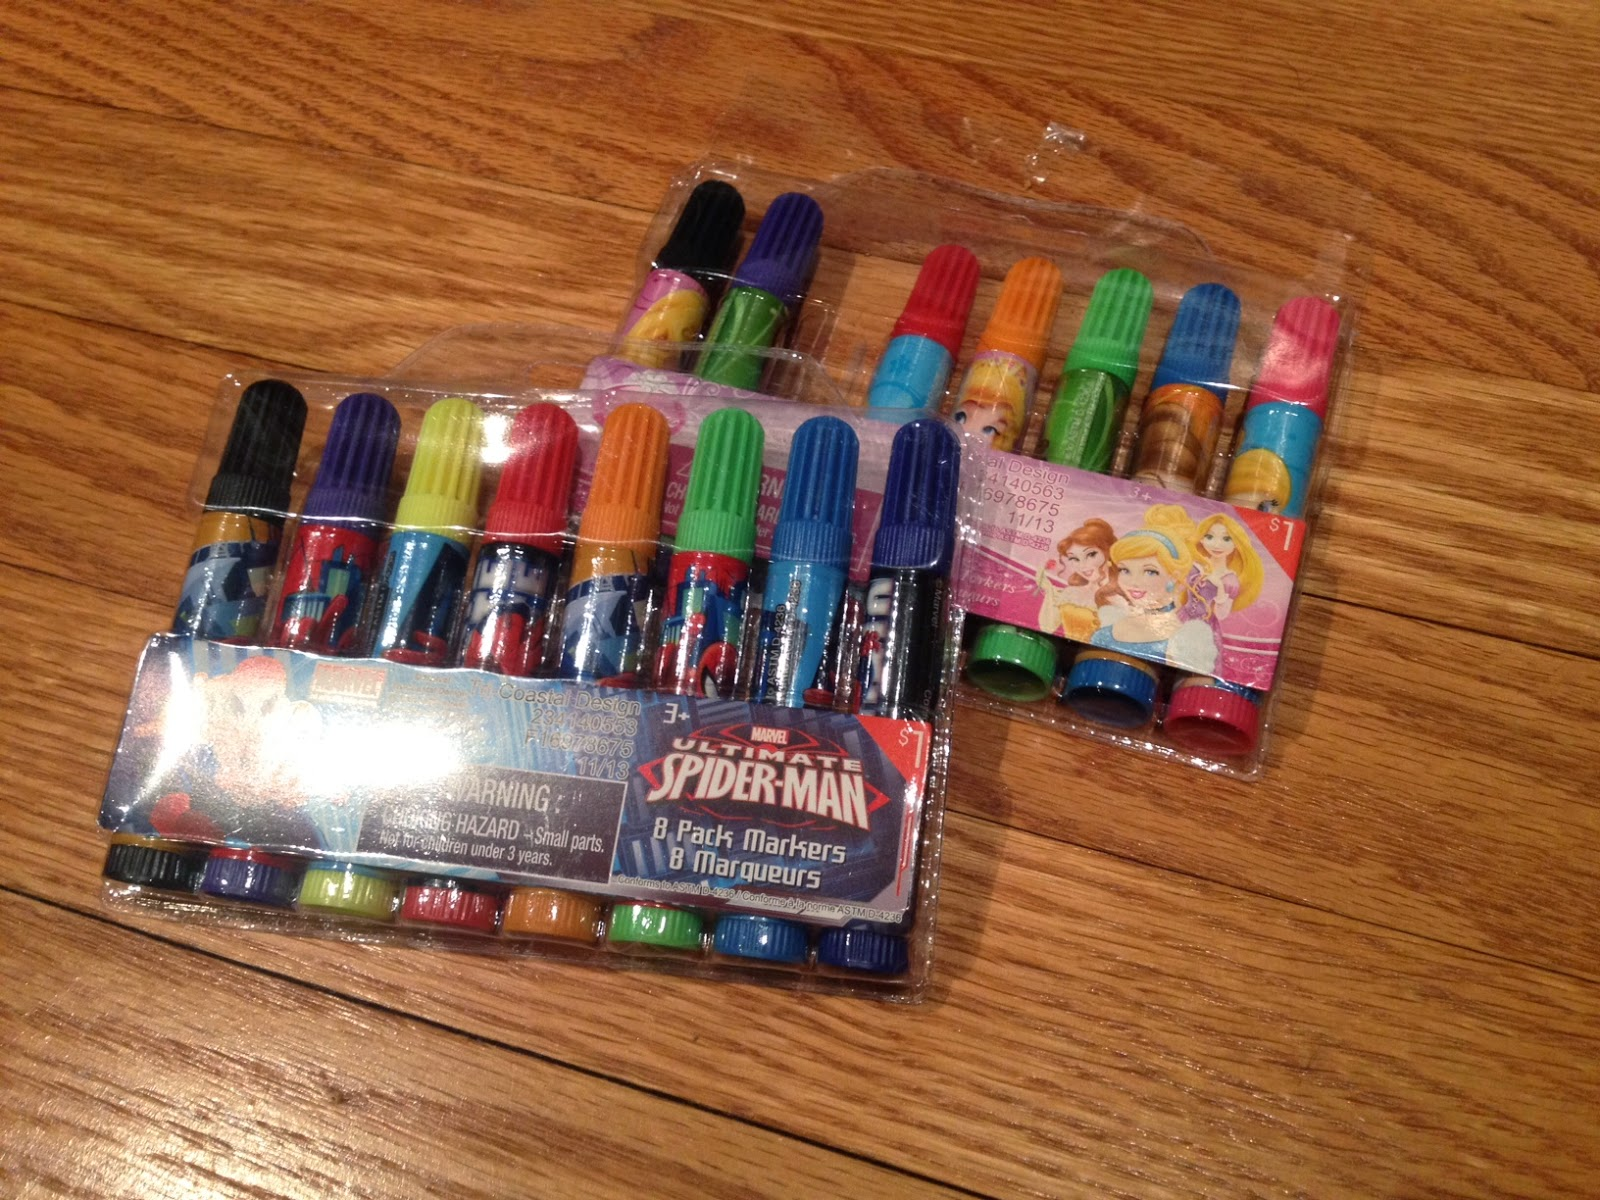 Sketch pen, holder, DIY, do it yourself, markers